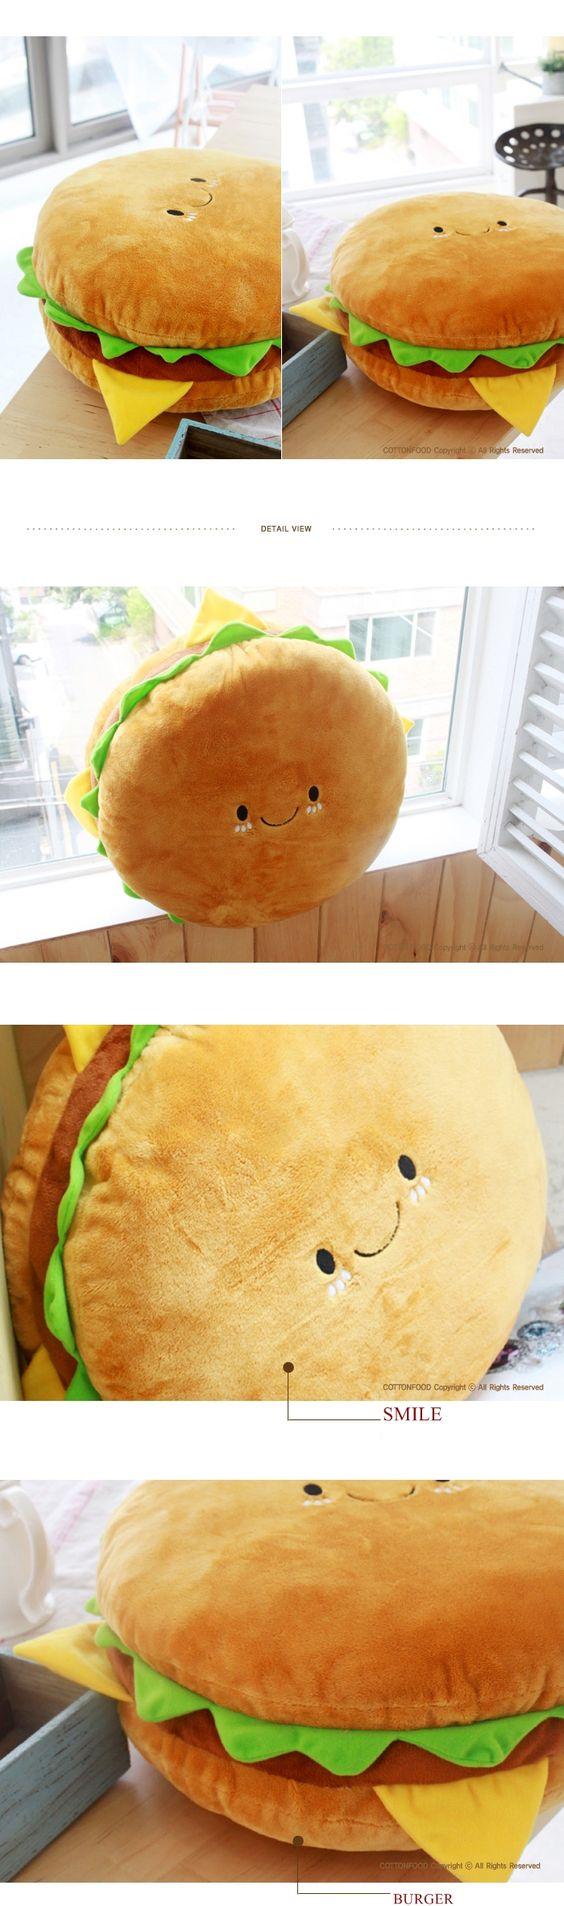 Burger pillow LINK: http://www.ebay.com/itm/PET-PILLOW-VARIOUS ...